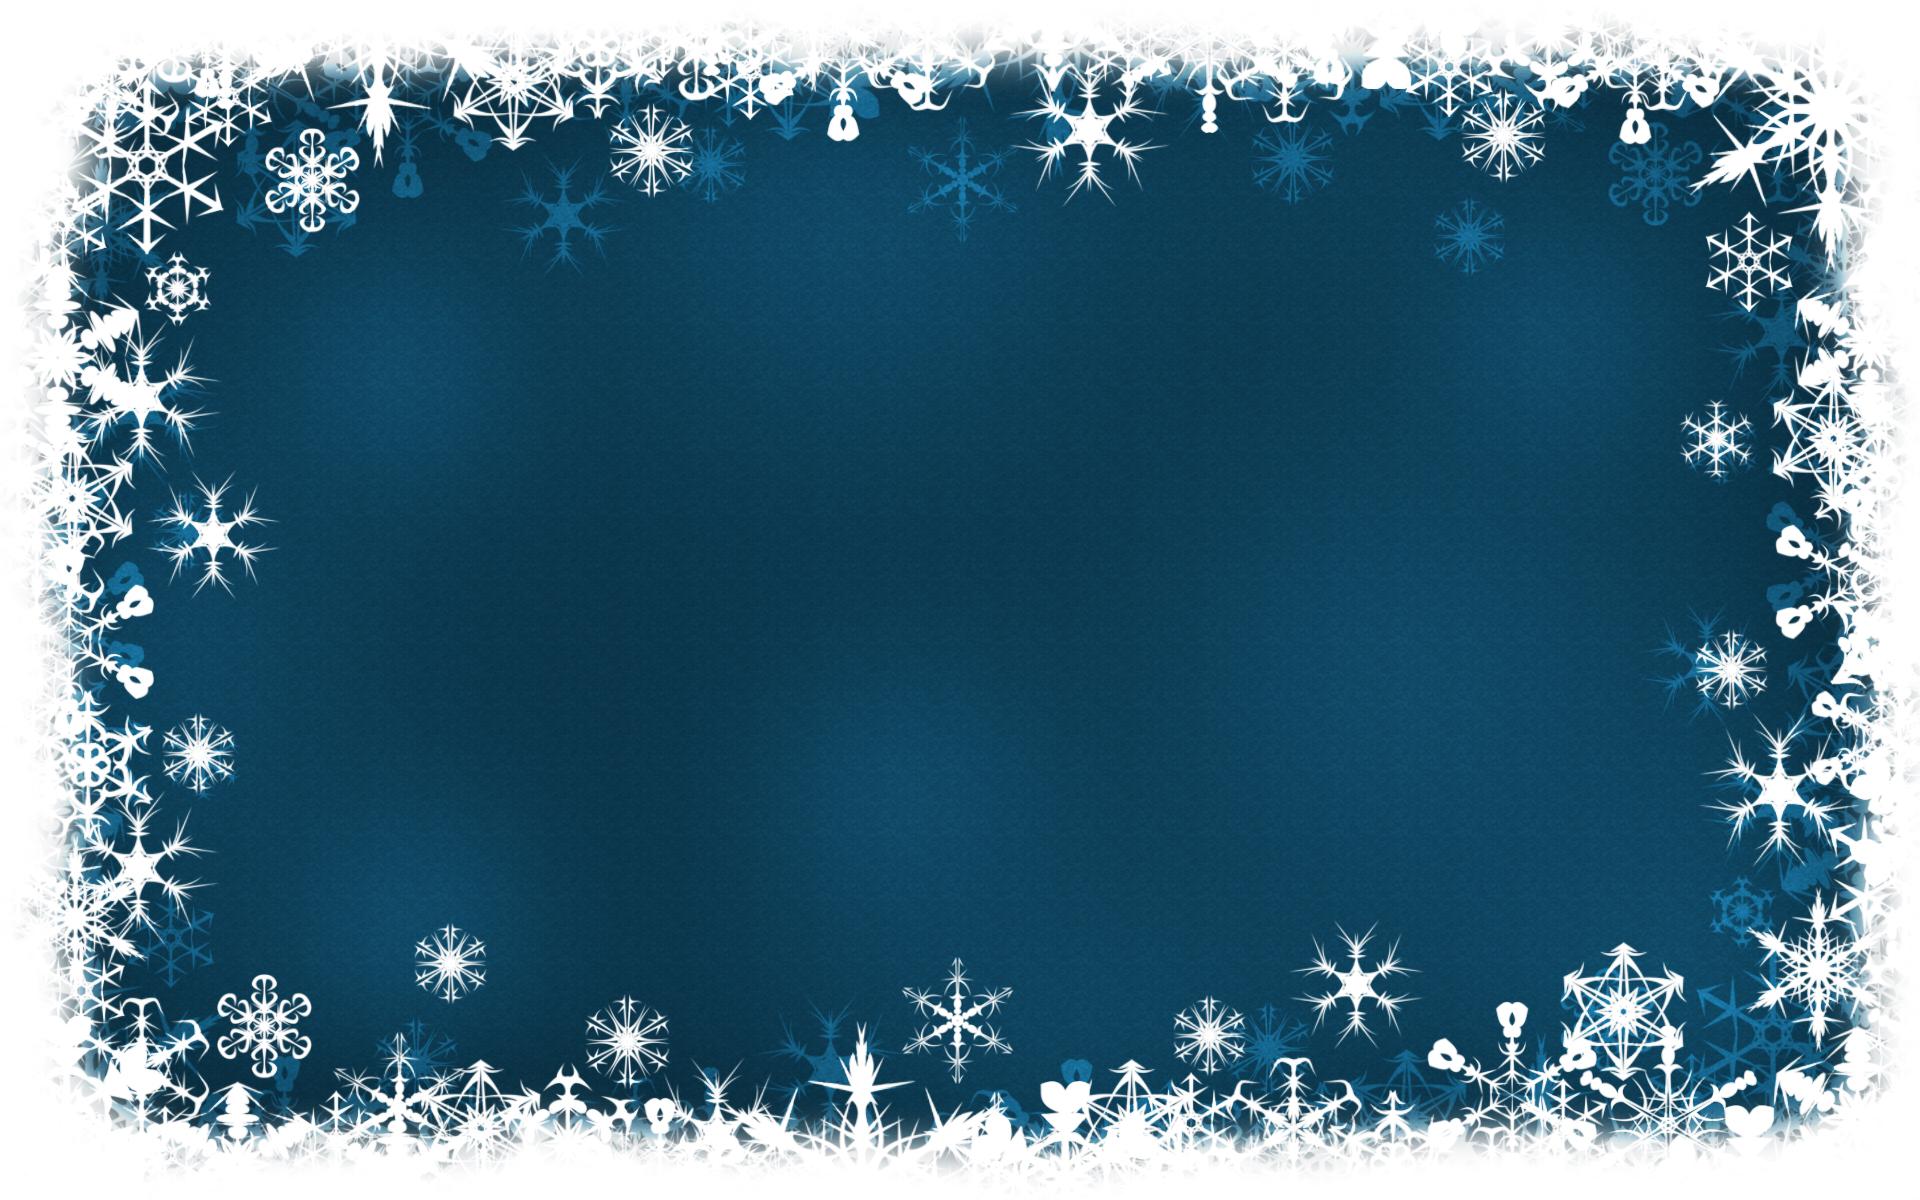 Christmas Backgrounds wallpaper   741521 1920x1200